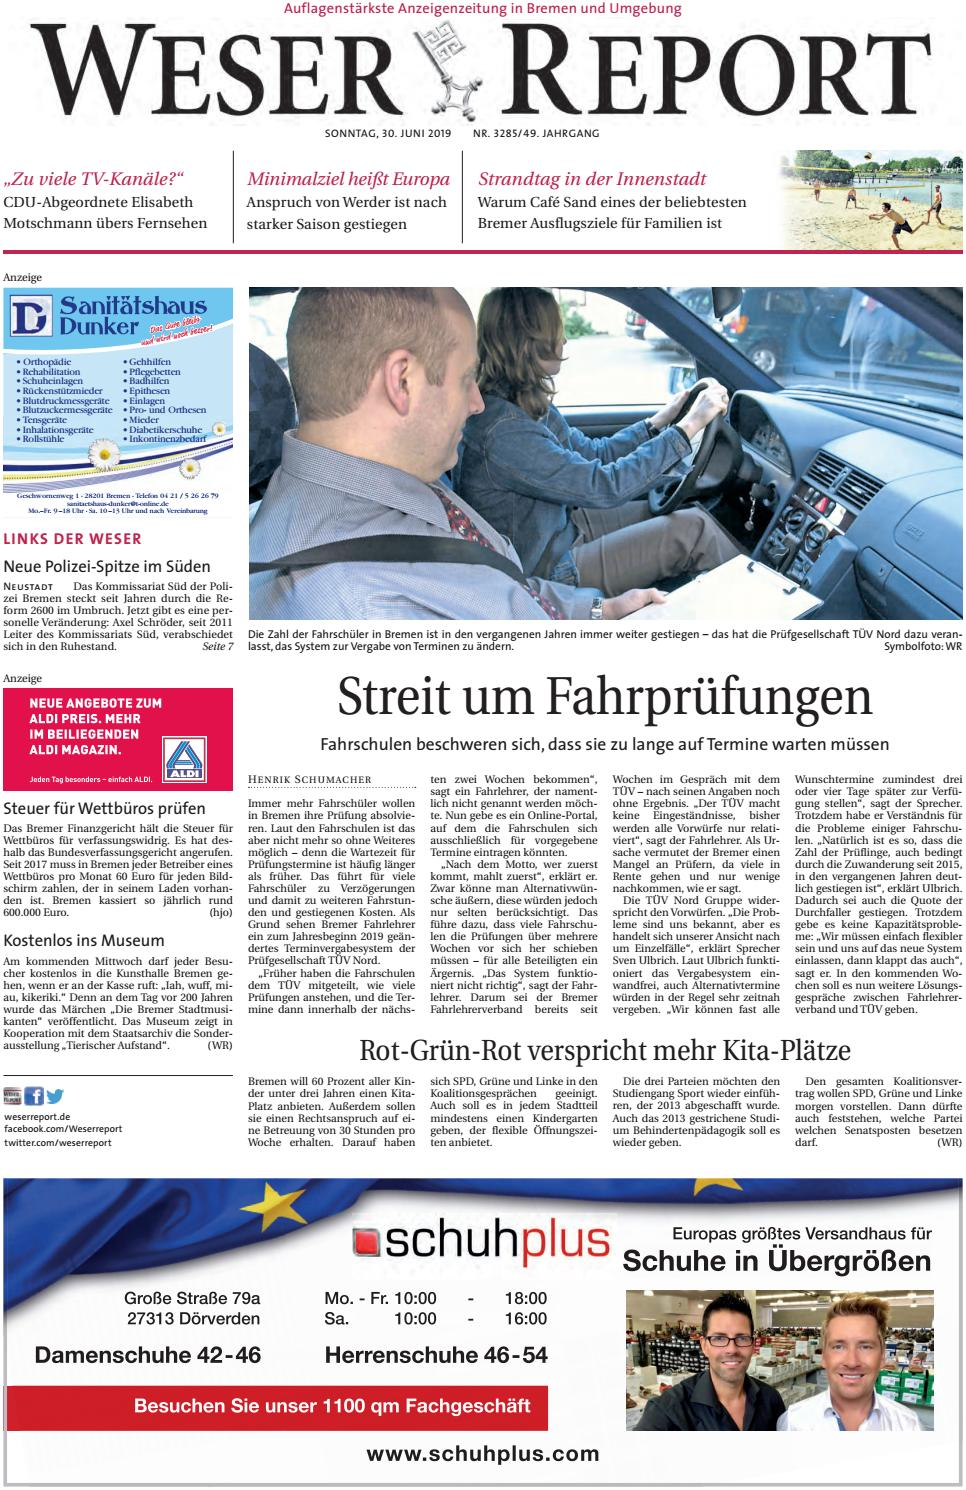 Weser Report Links der Weser vom 30.06.2019 by KPS